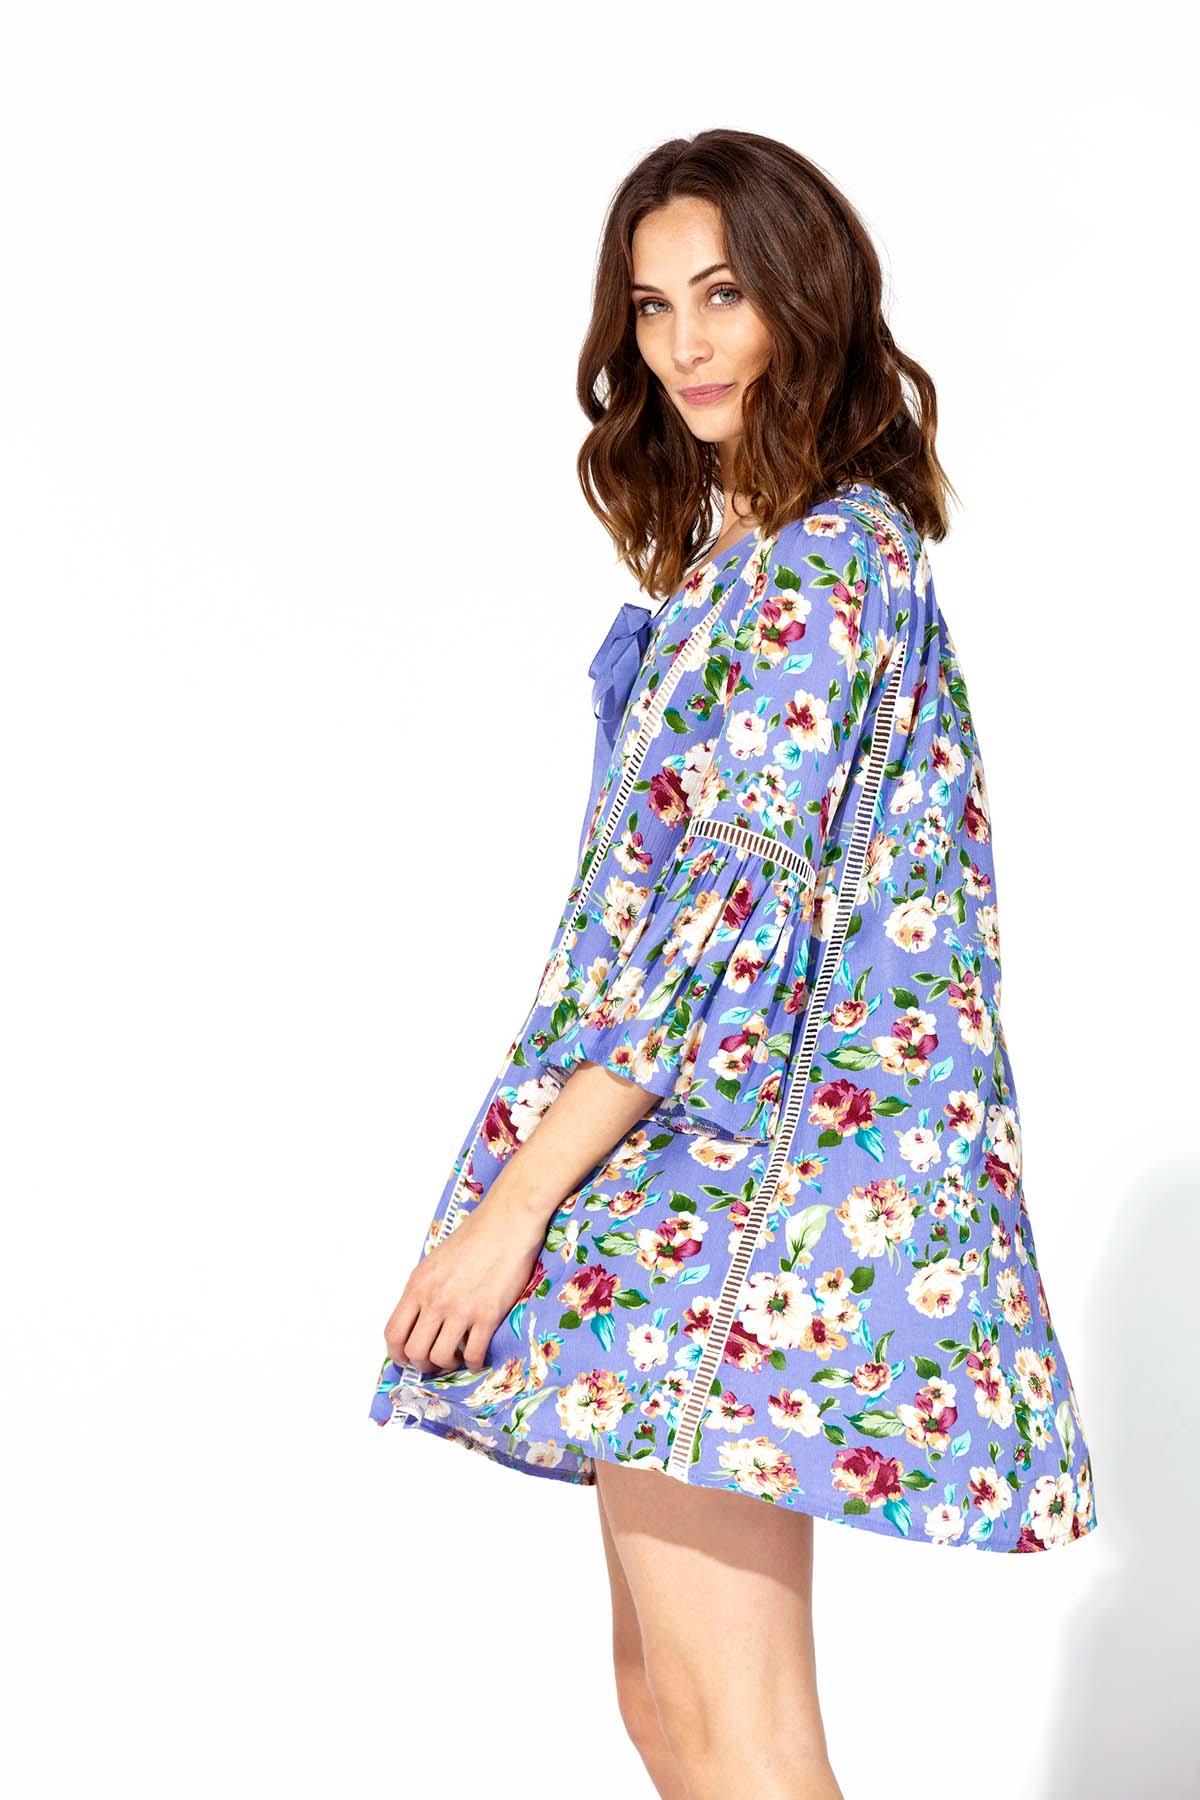 Vestido azul de flores